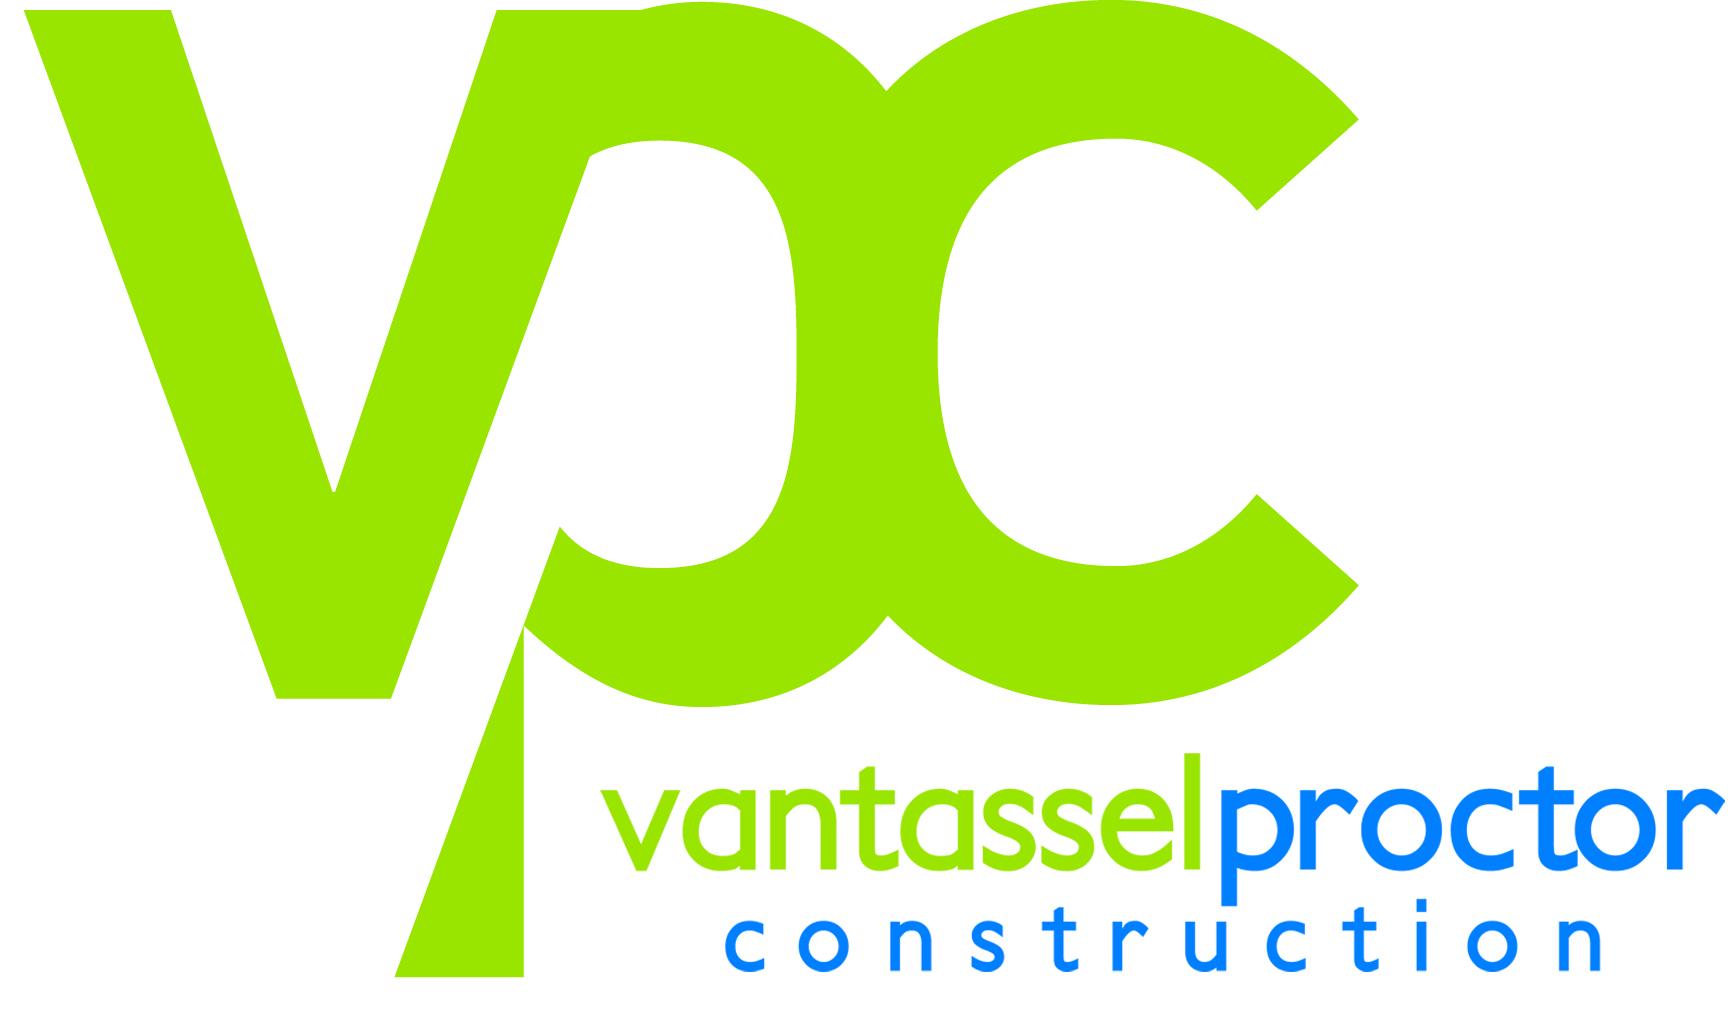 VANTASSEL PROCTOR CONSTRUCTION